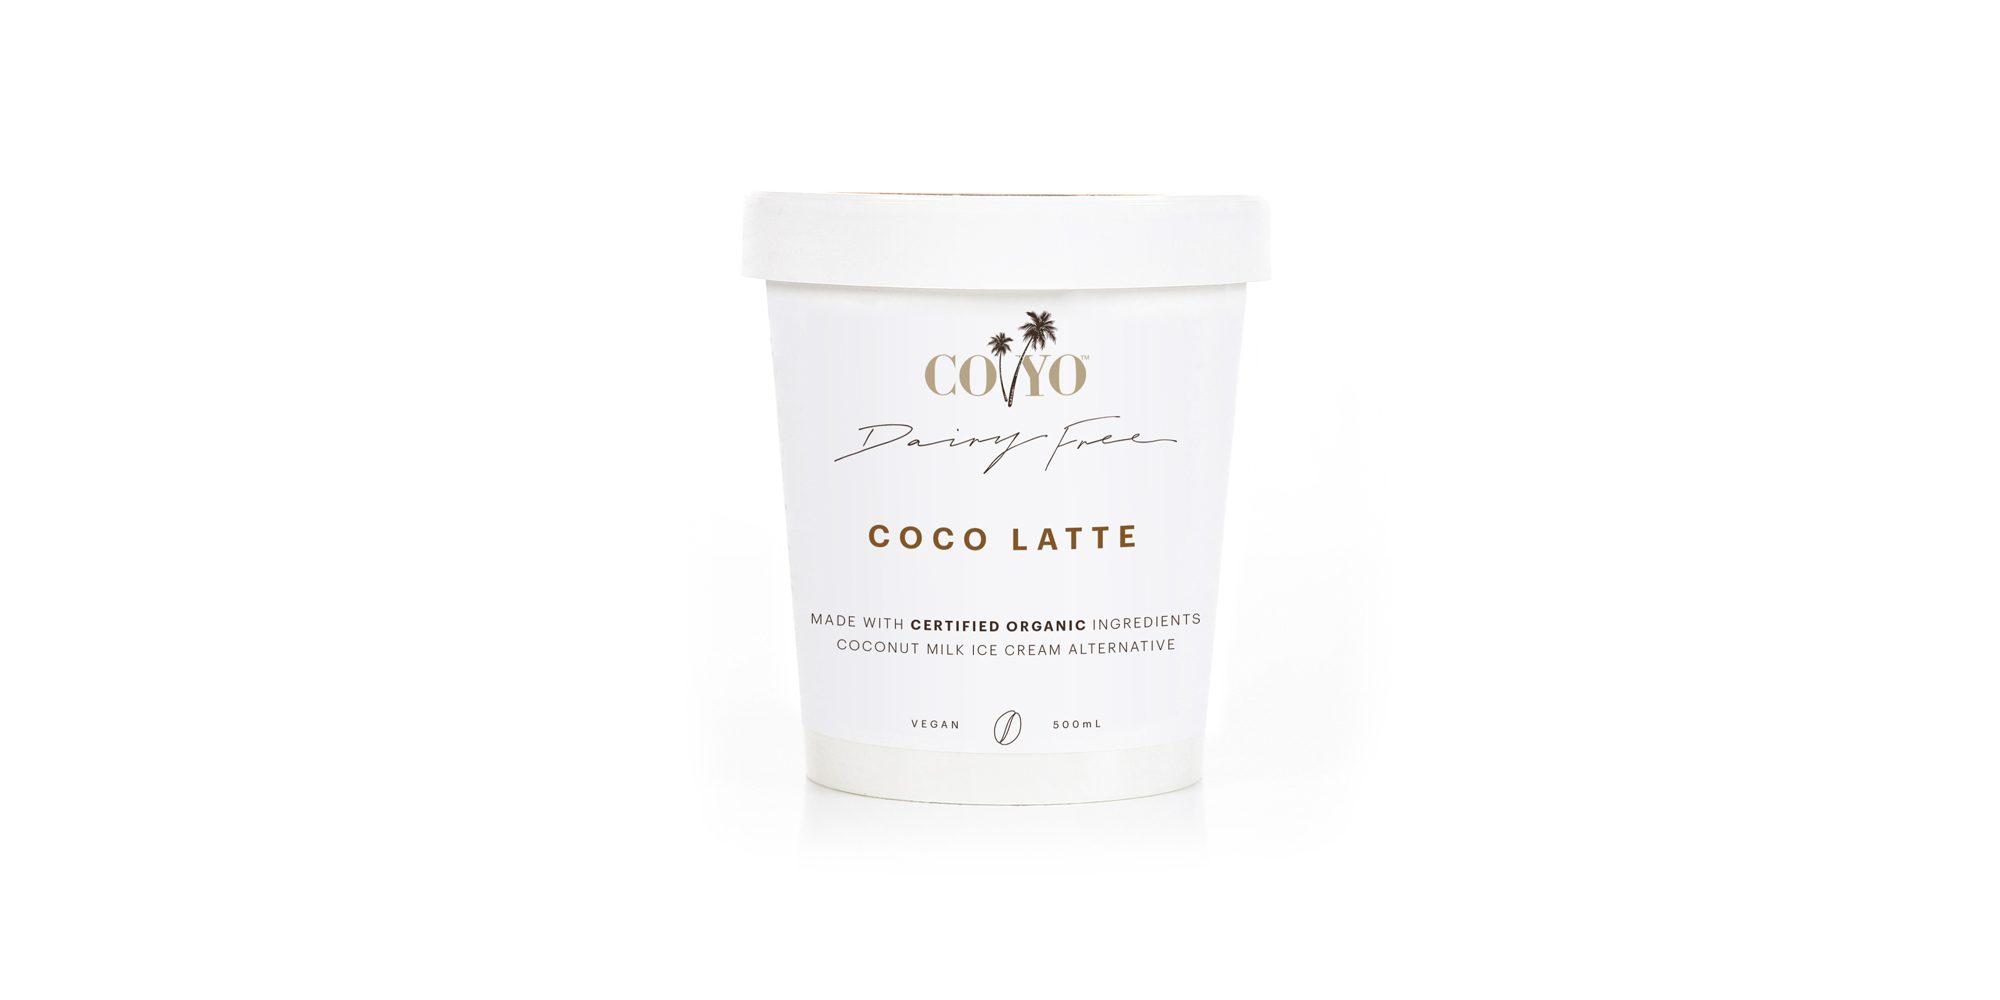 COYO OCOC LATTE DAIRY FREE COCONUT